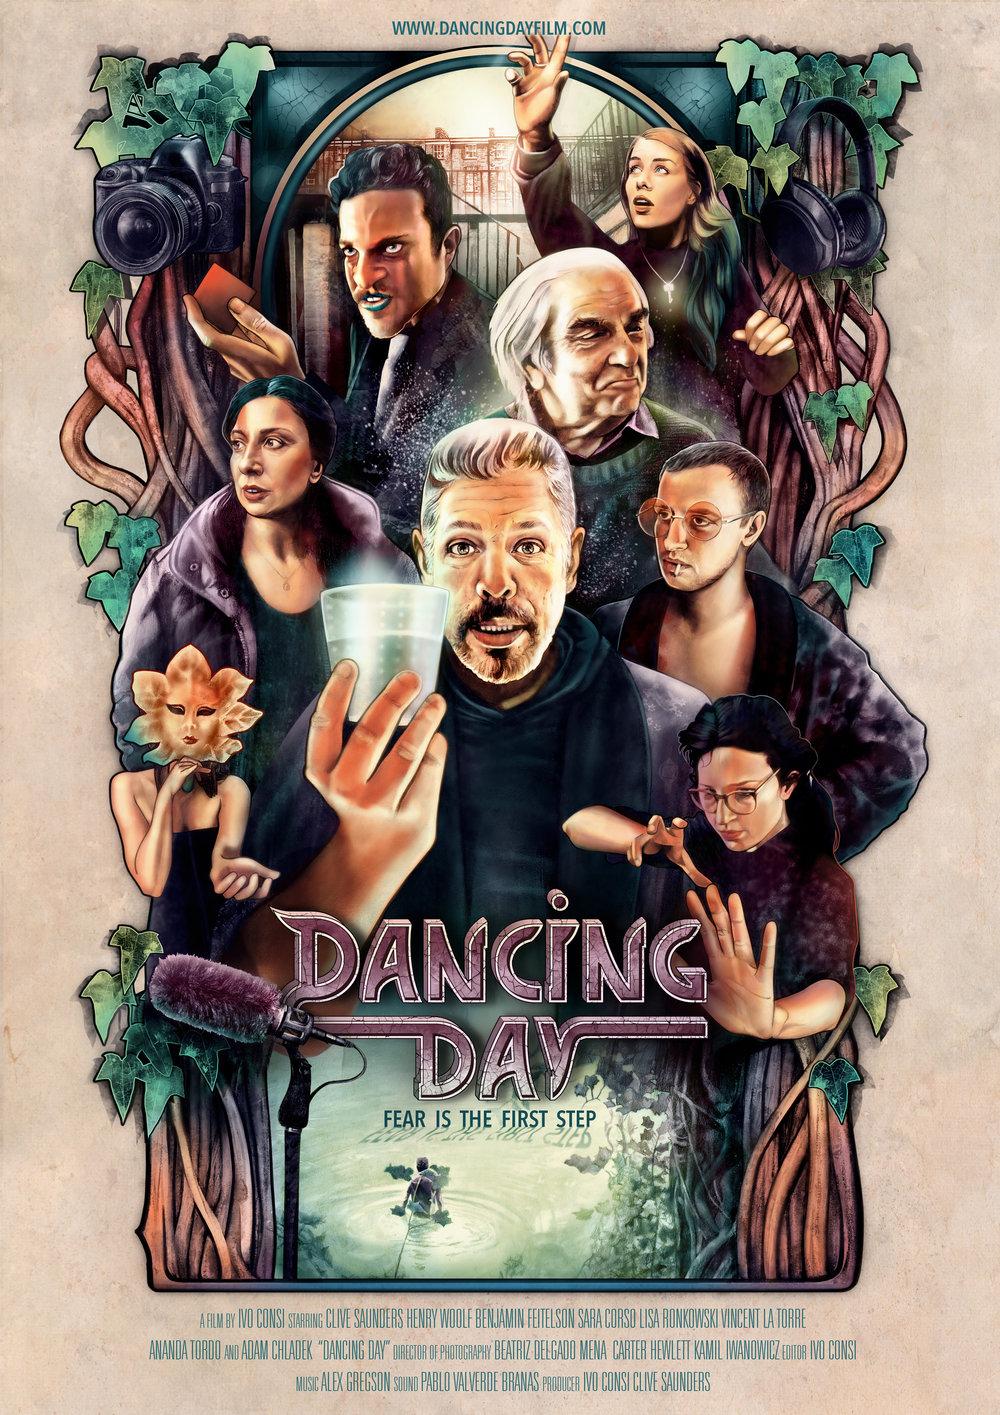 Dancing Day FINALFINAL-A4.jpg